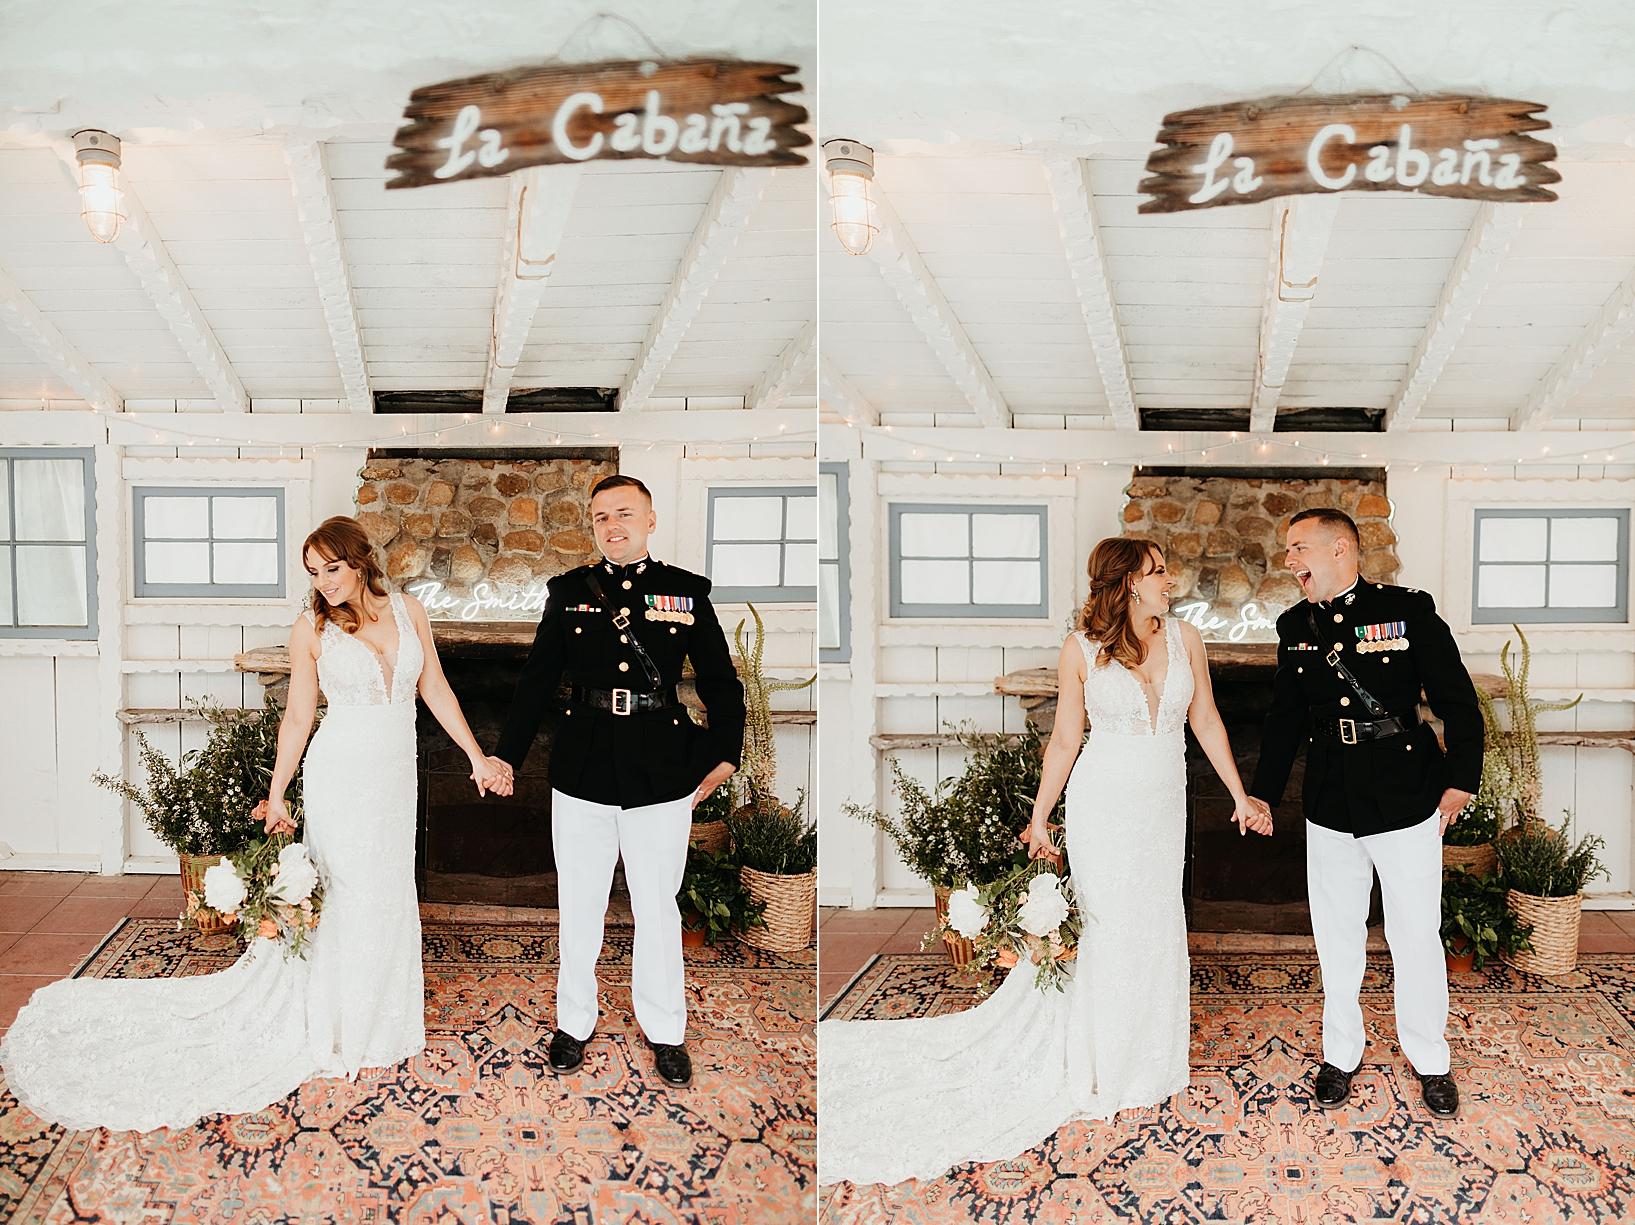 Leo-Carrillo-Ranch-Wedding-117.jpg